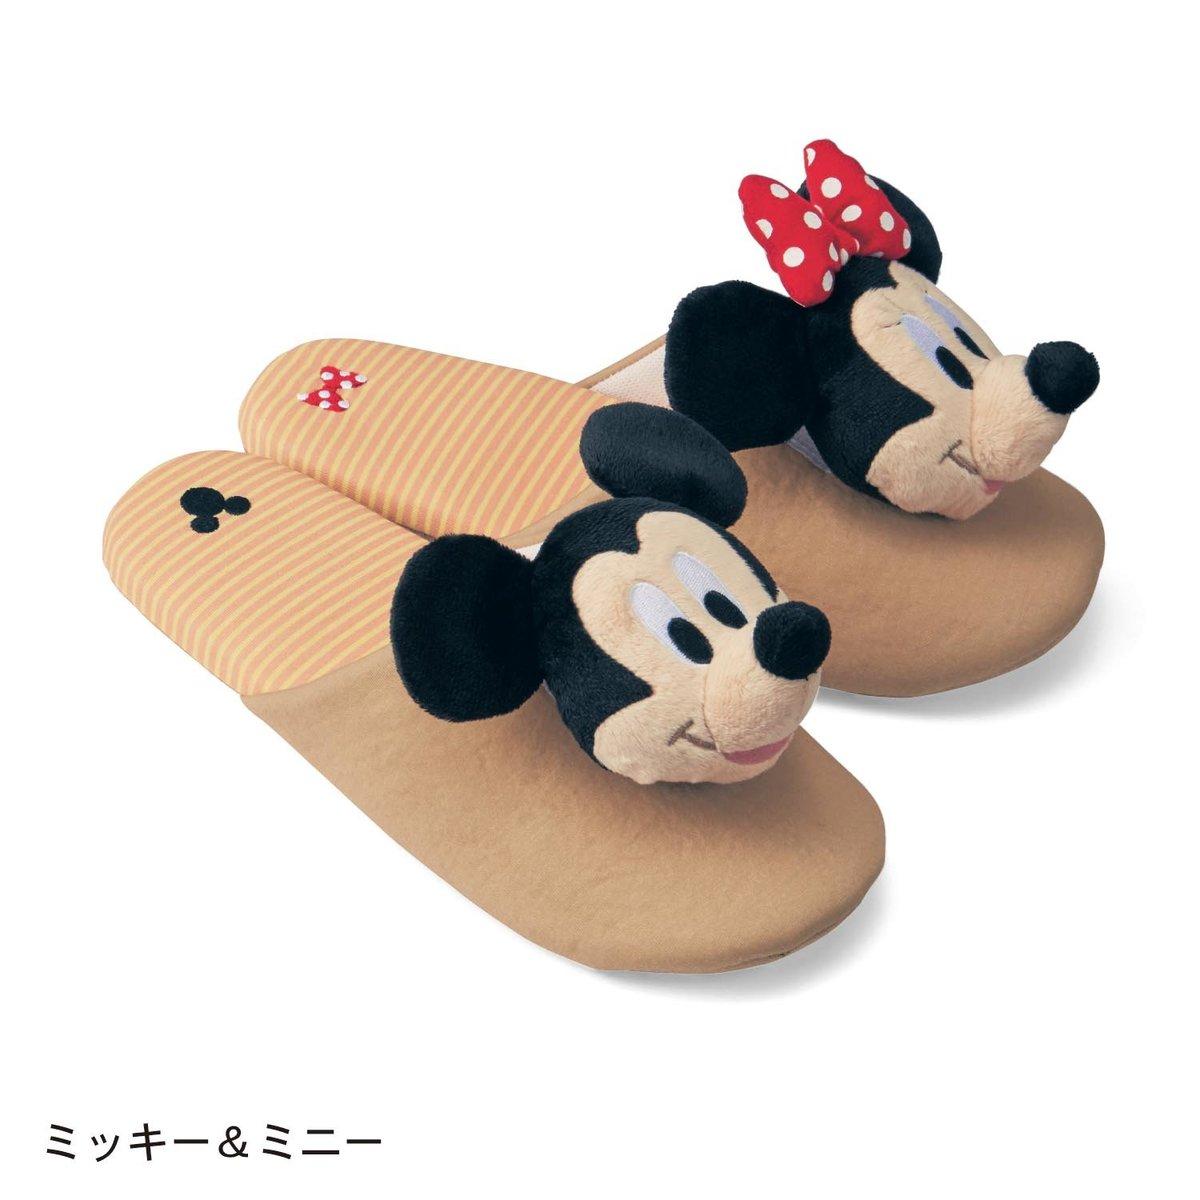 (Mickey & Minnie) Japan Disney Cartoon Slippers (Removable Plush Toys on Top)